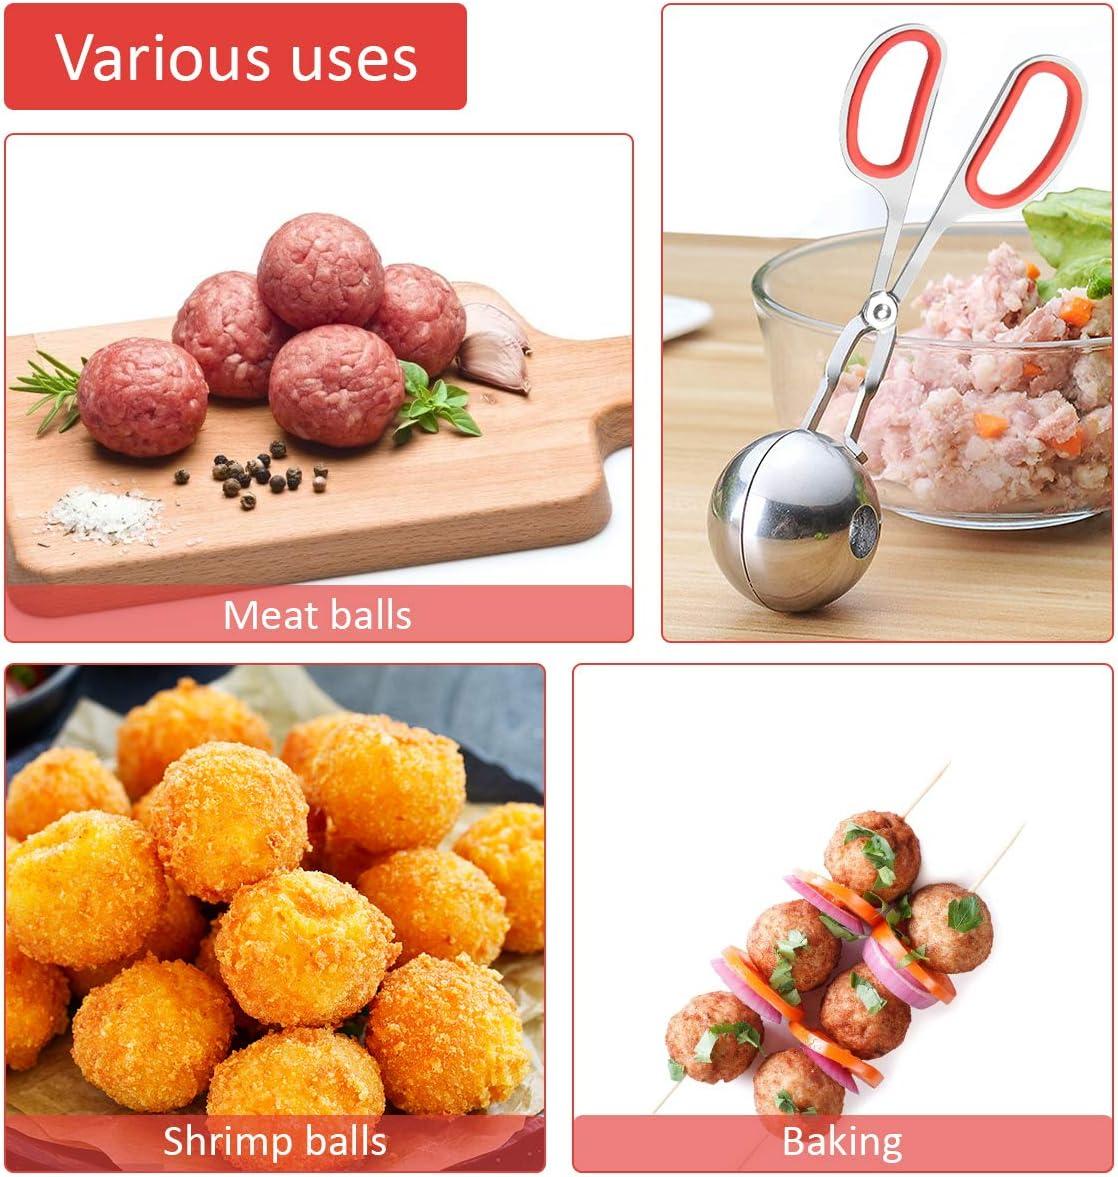 Different Size Stainless Steel Meat Baller scoop with Detachable Anti-Slip Handles 2PCS Meatball Maker Cake Pop Baller Ahier Meatball/Scoop/Ball/Maker